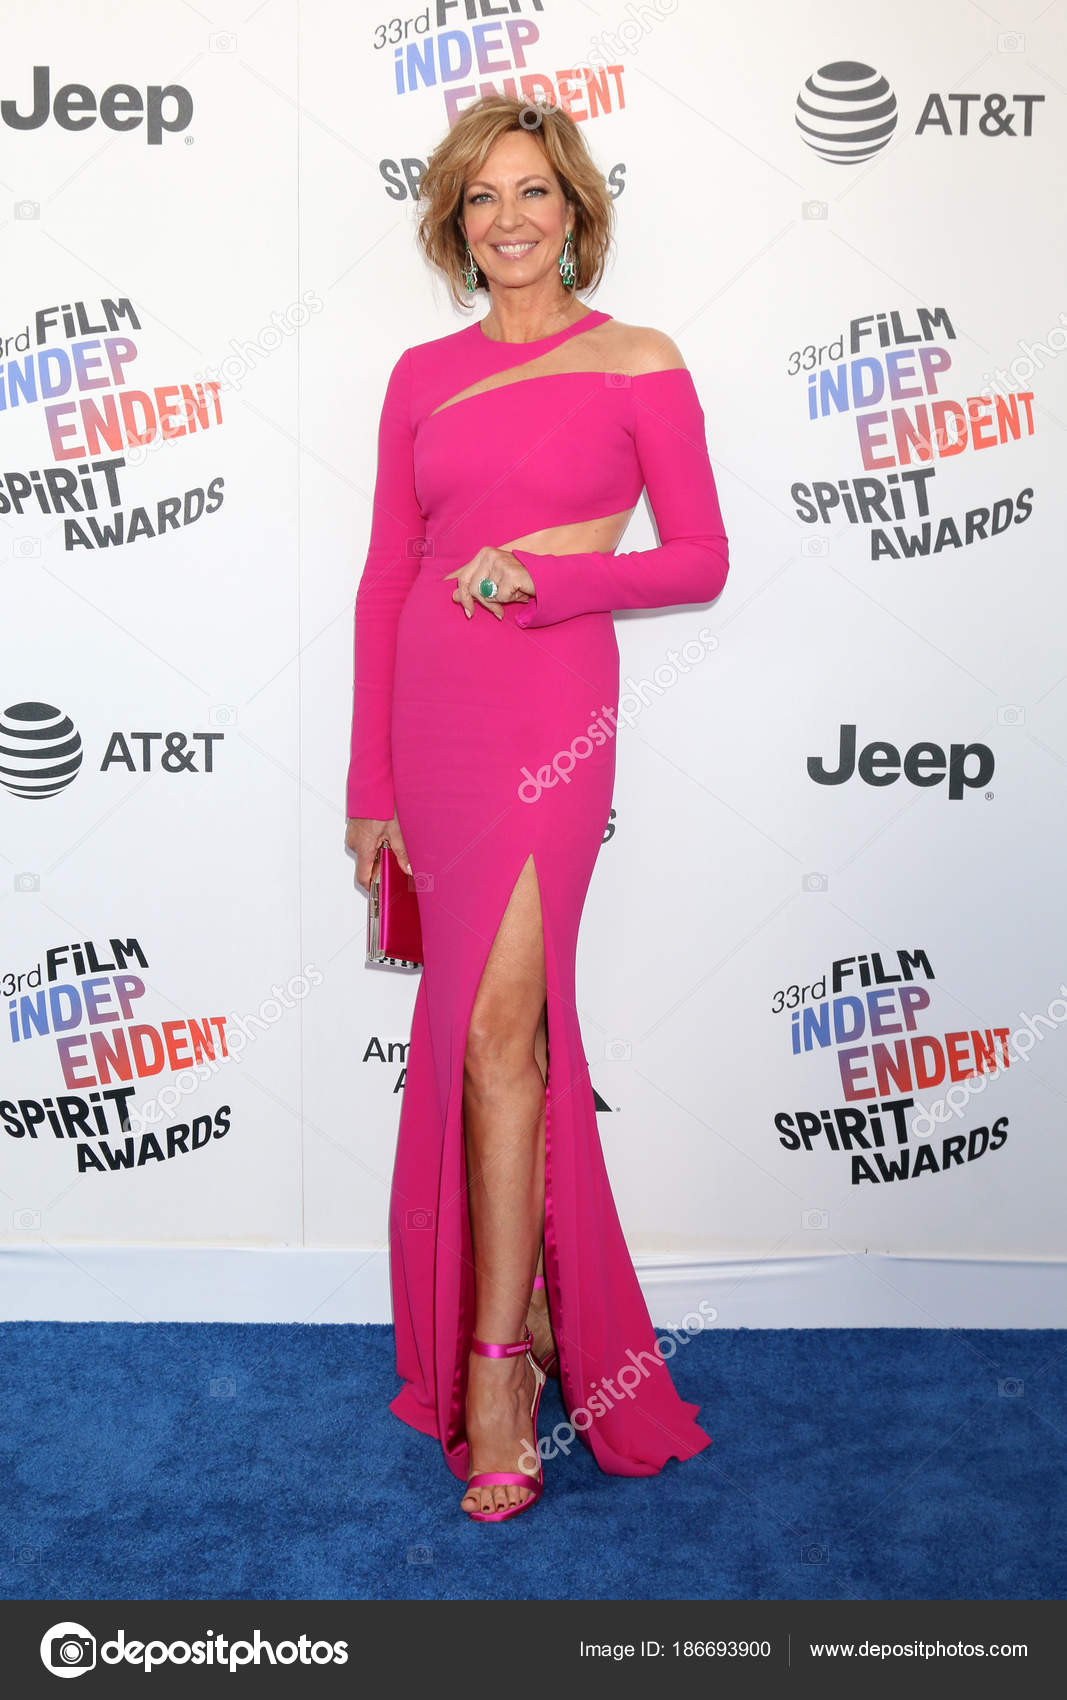 Allison Janney Pics actress allison janney – stock editorial photo © jean_nelson